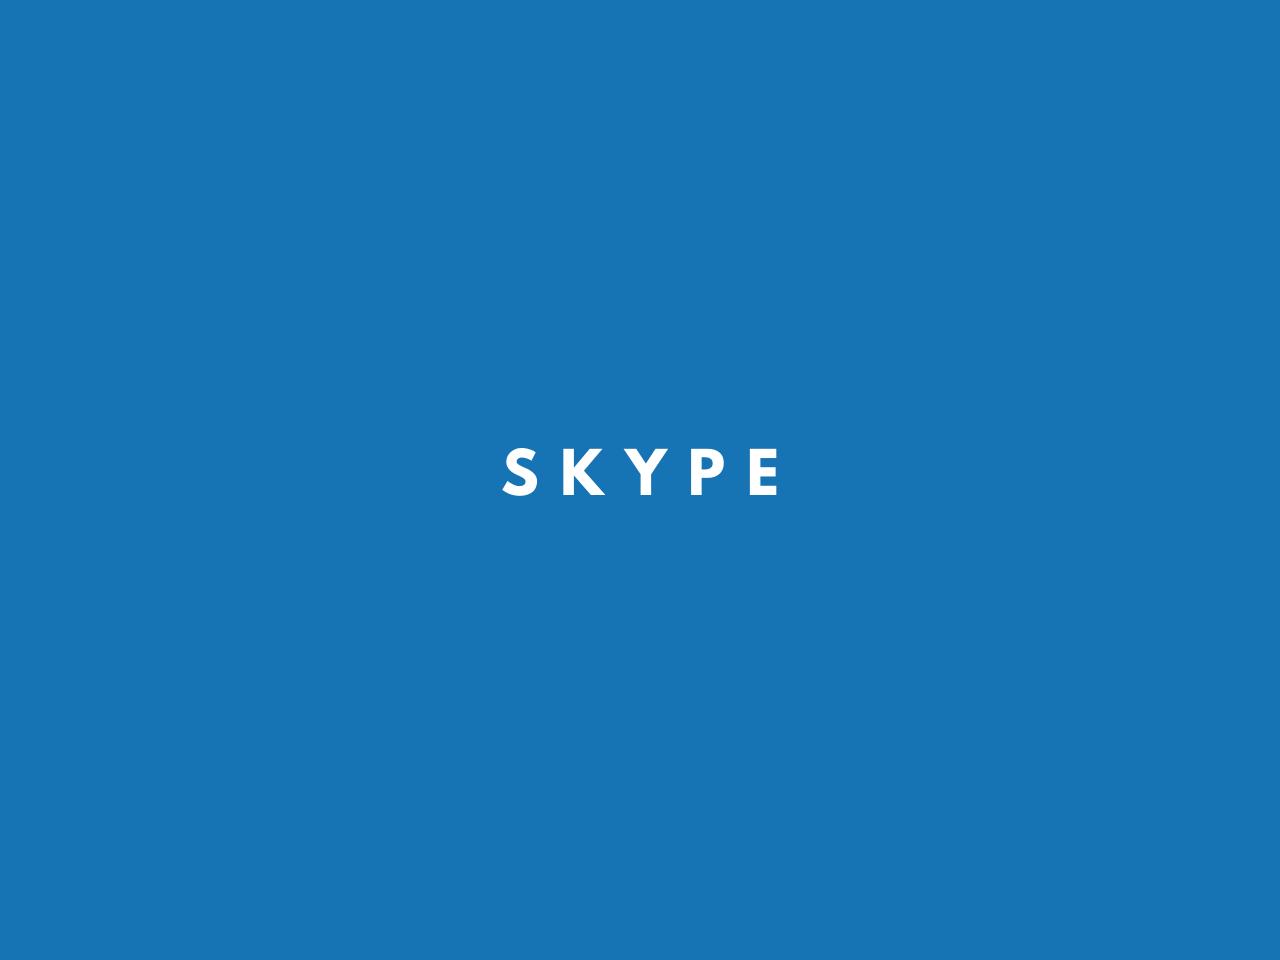 Skype「スカイプ」の会員登録方法【簡単5ステップ】